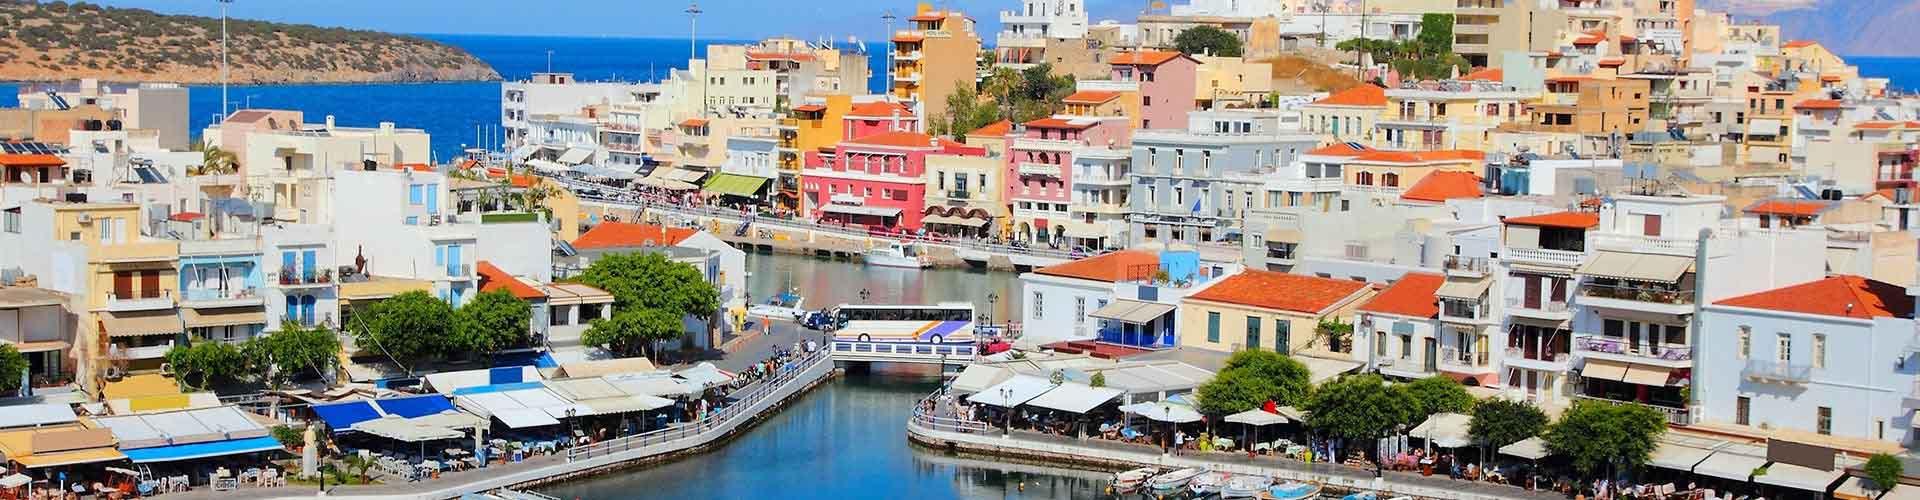 Kreetan saari – Hostellit kohteessa Kreetan saari. Kreetan saari -karttoja, valokuvia ja arvosteluja kaikista Kreetan saari -hostelleista.